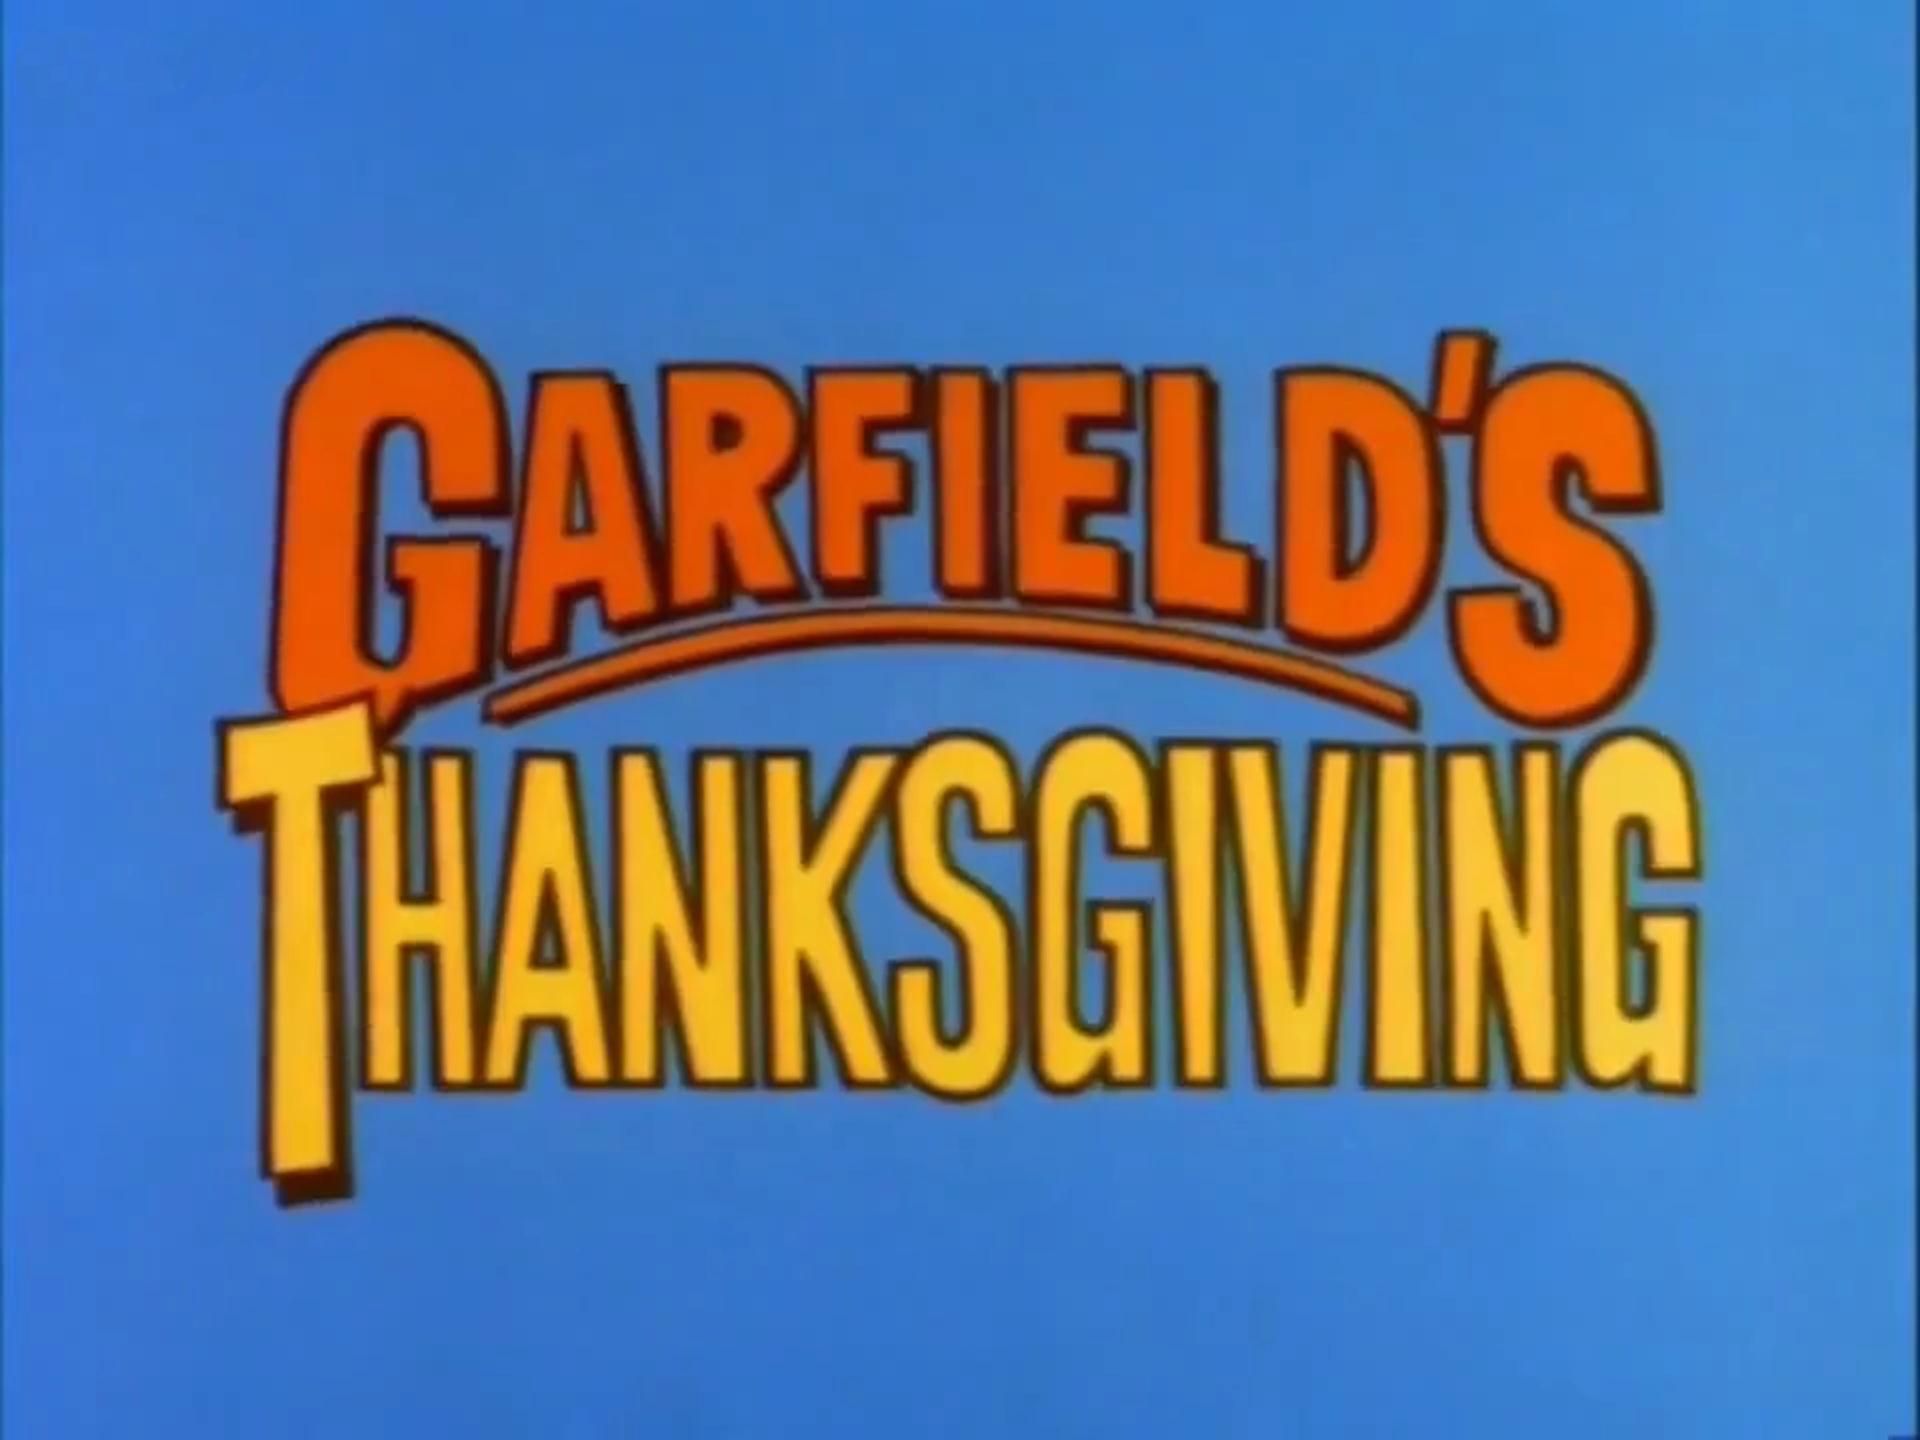 File:Garfieldsthanksgiving.PNG